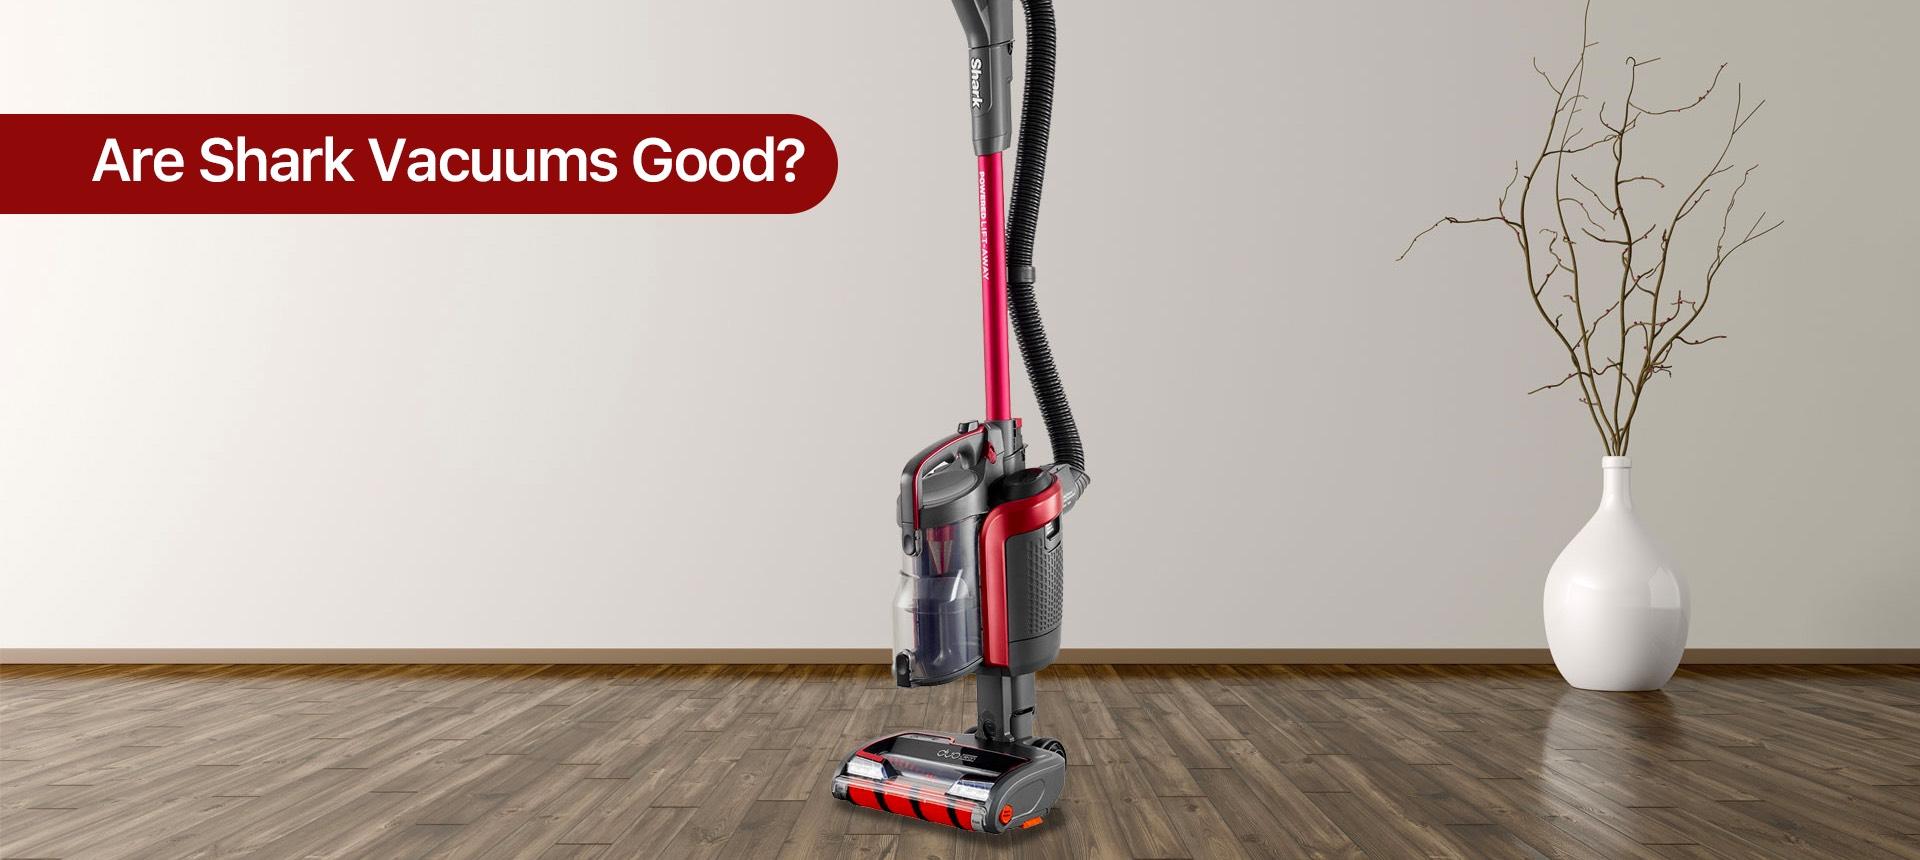 Are Shark Vacuums Good?